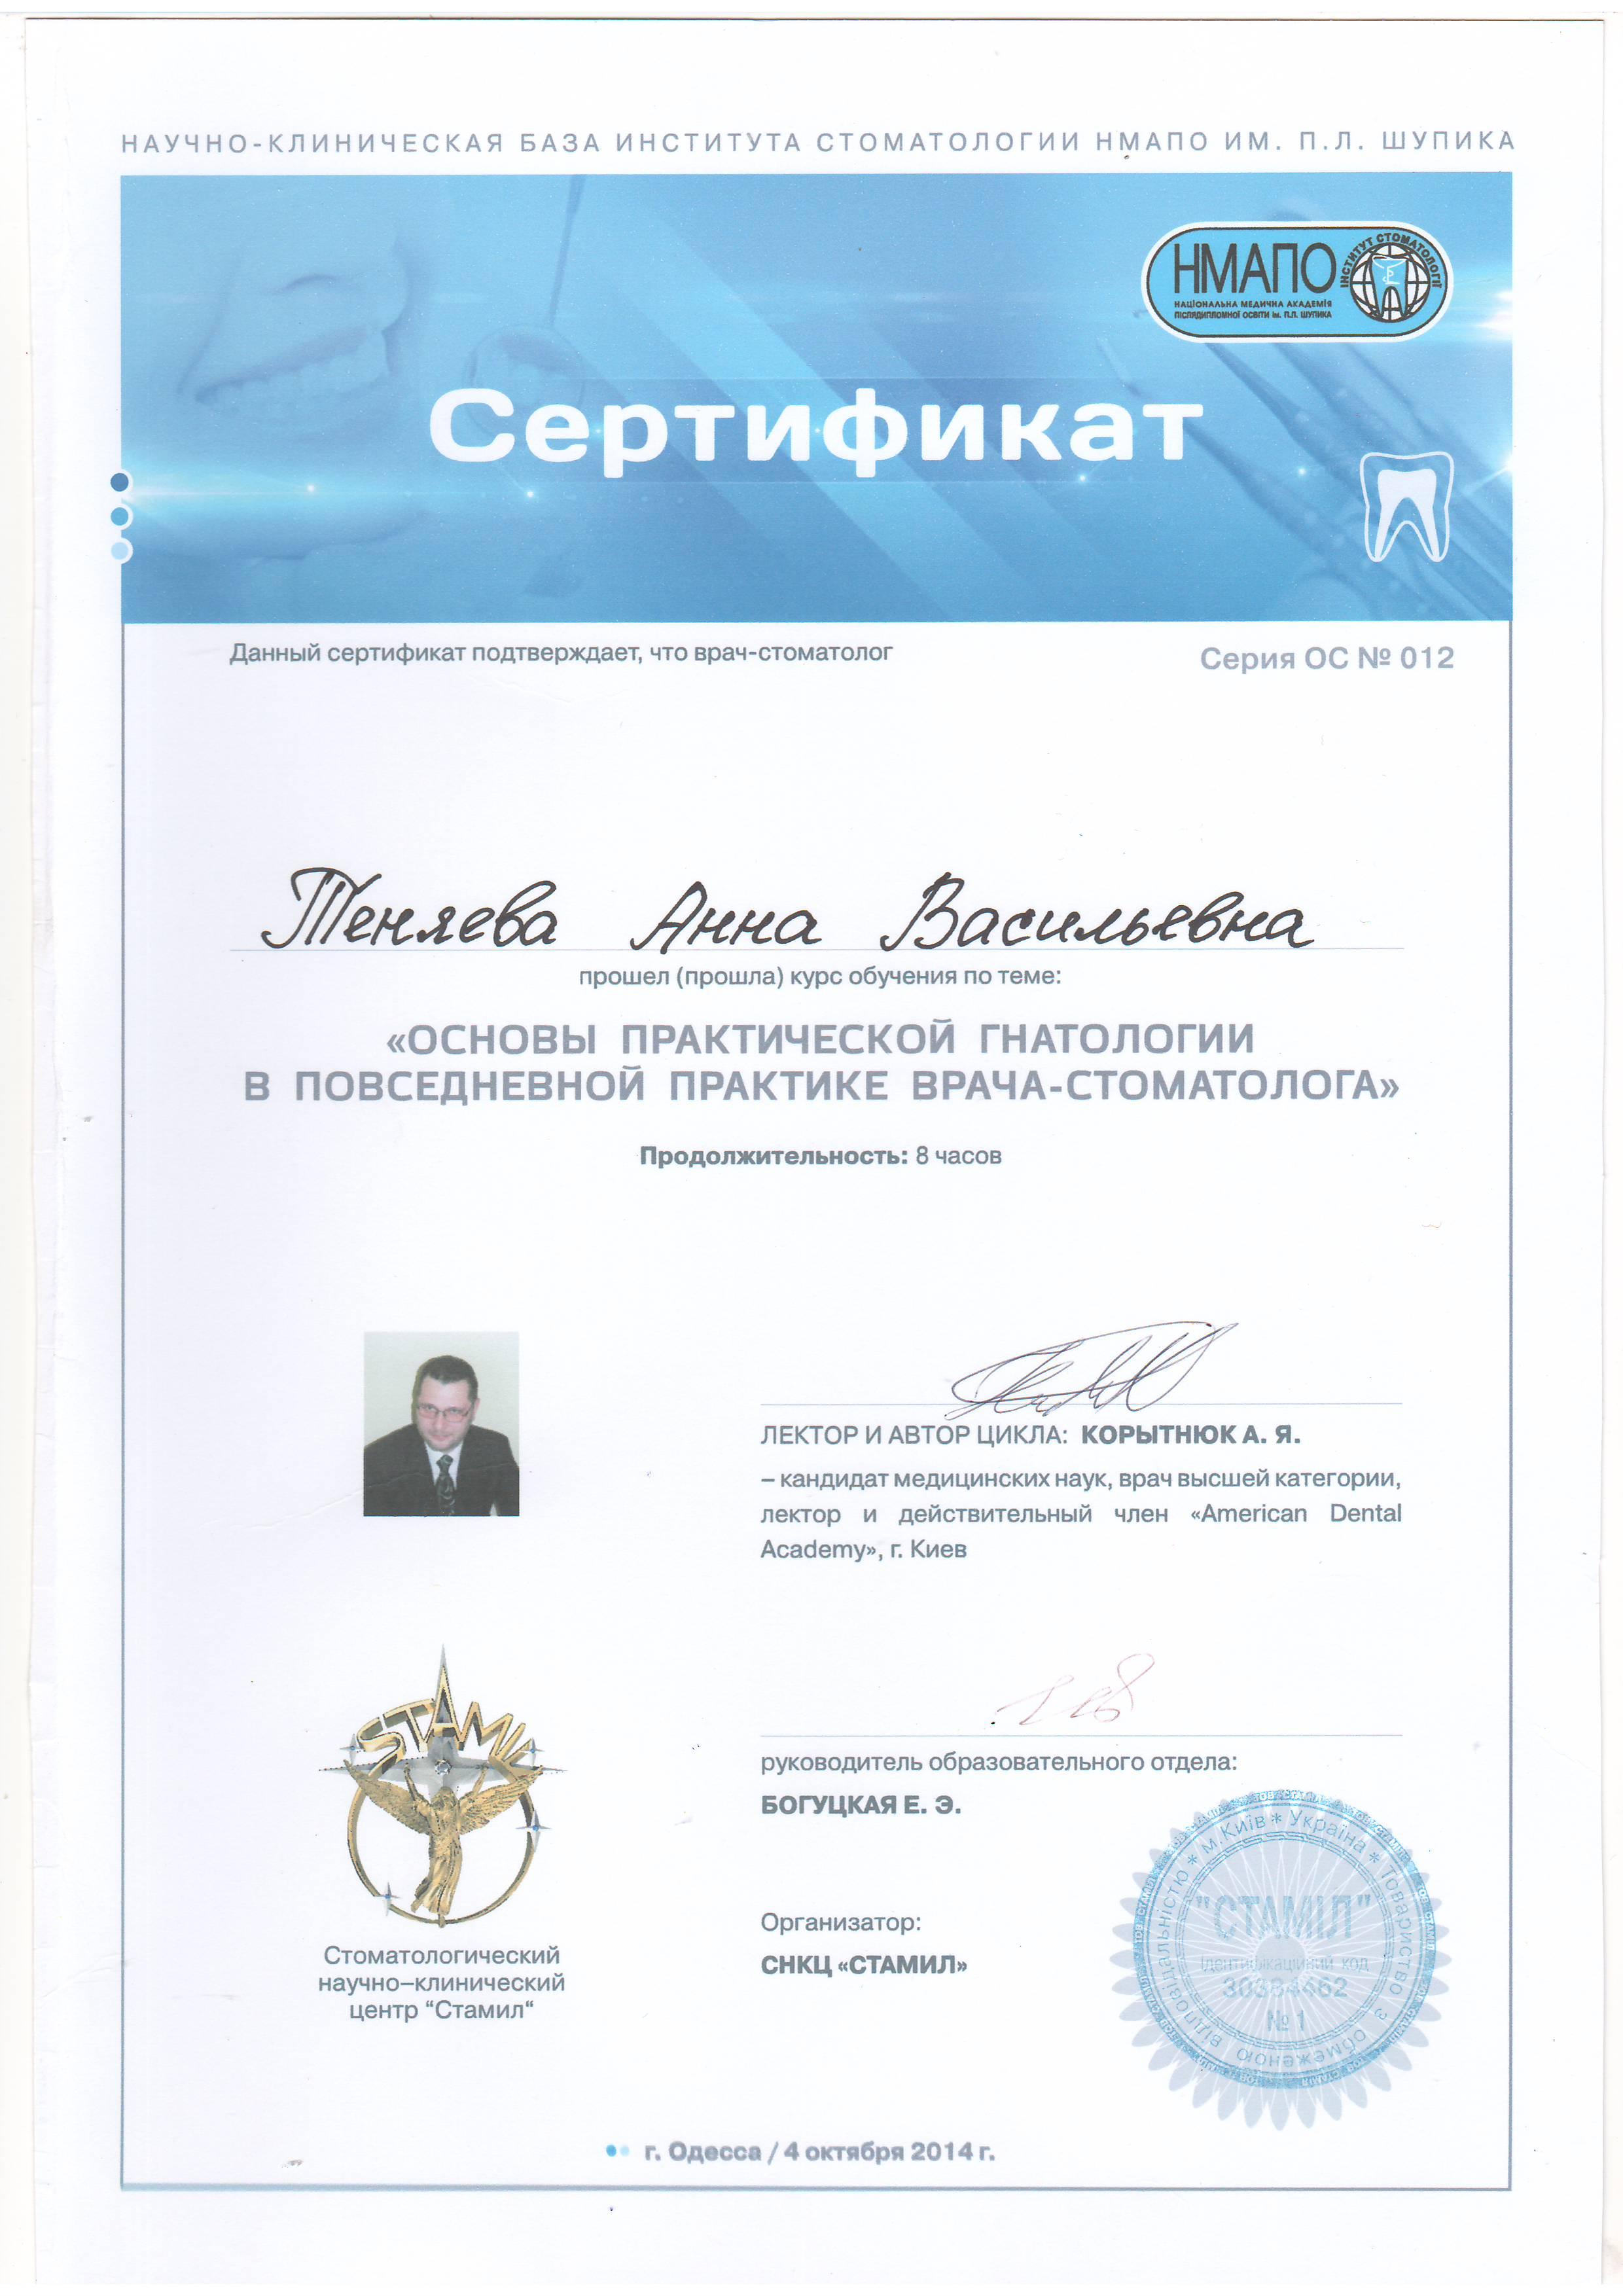 Сертификат 62